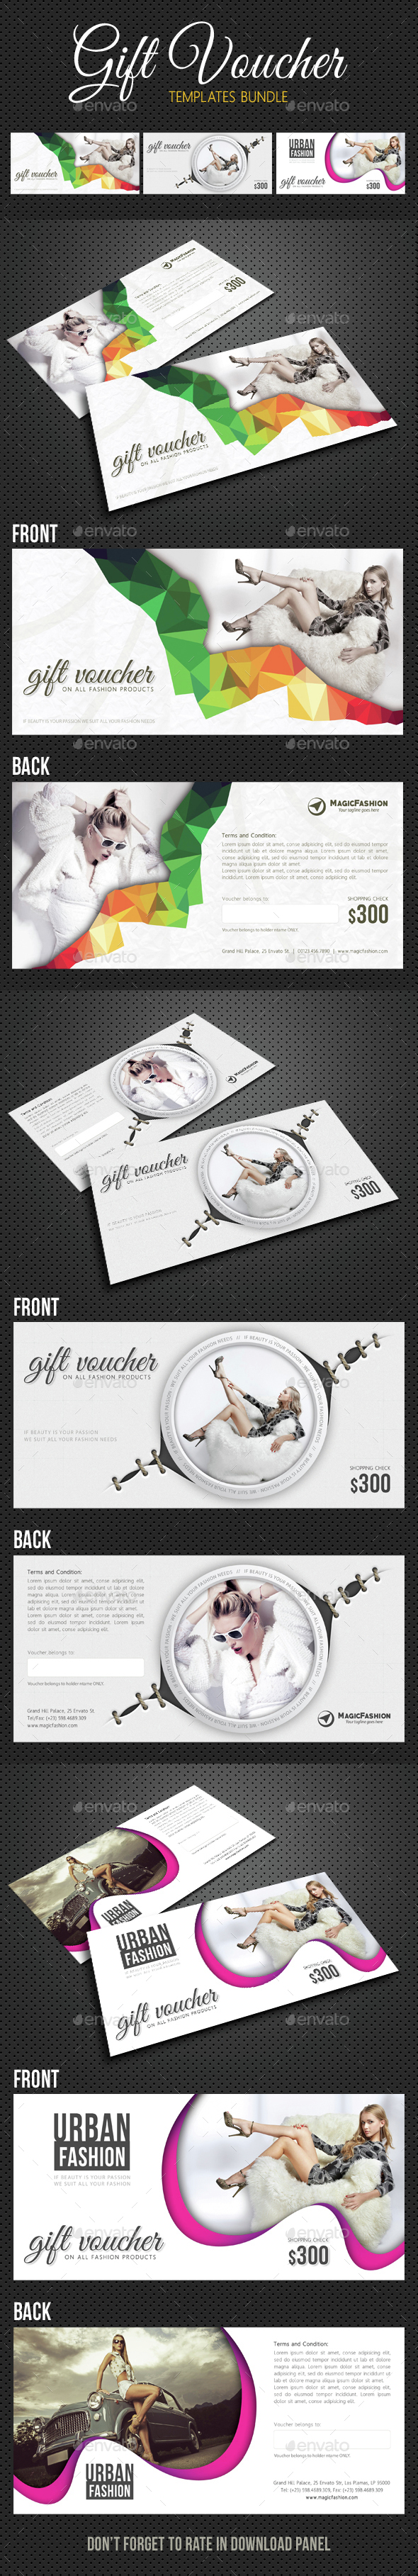 3 in 1 Elegant Gift Voucher Bundle 02 - Cards & Invites Print Templates